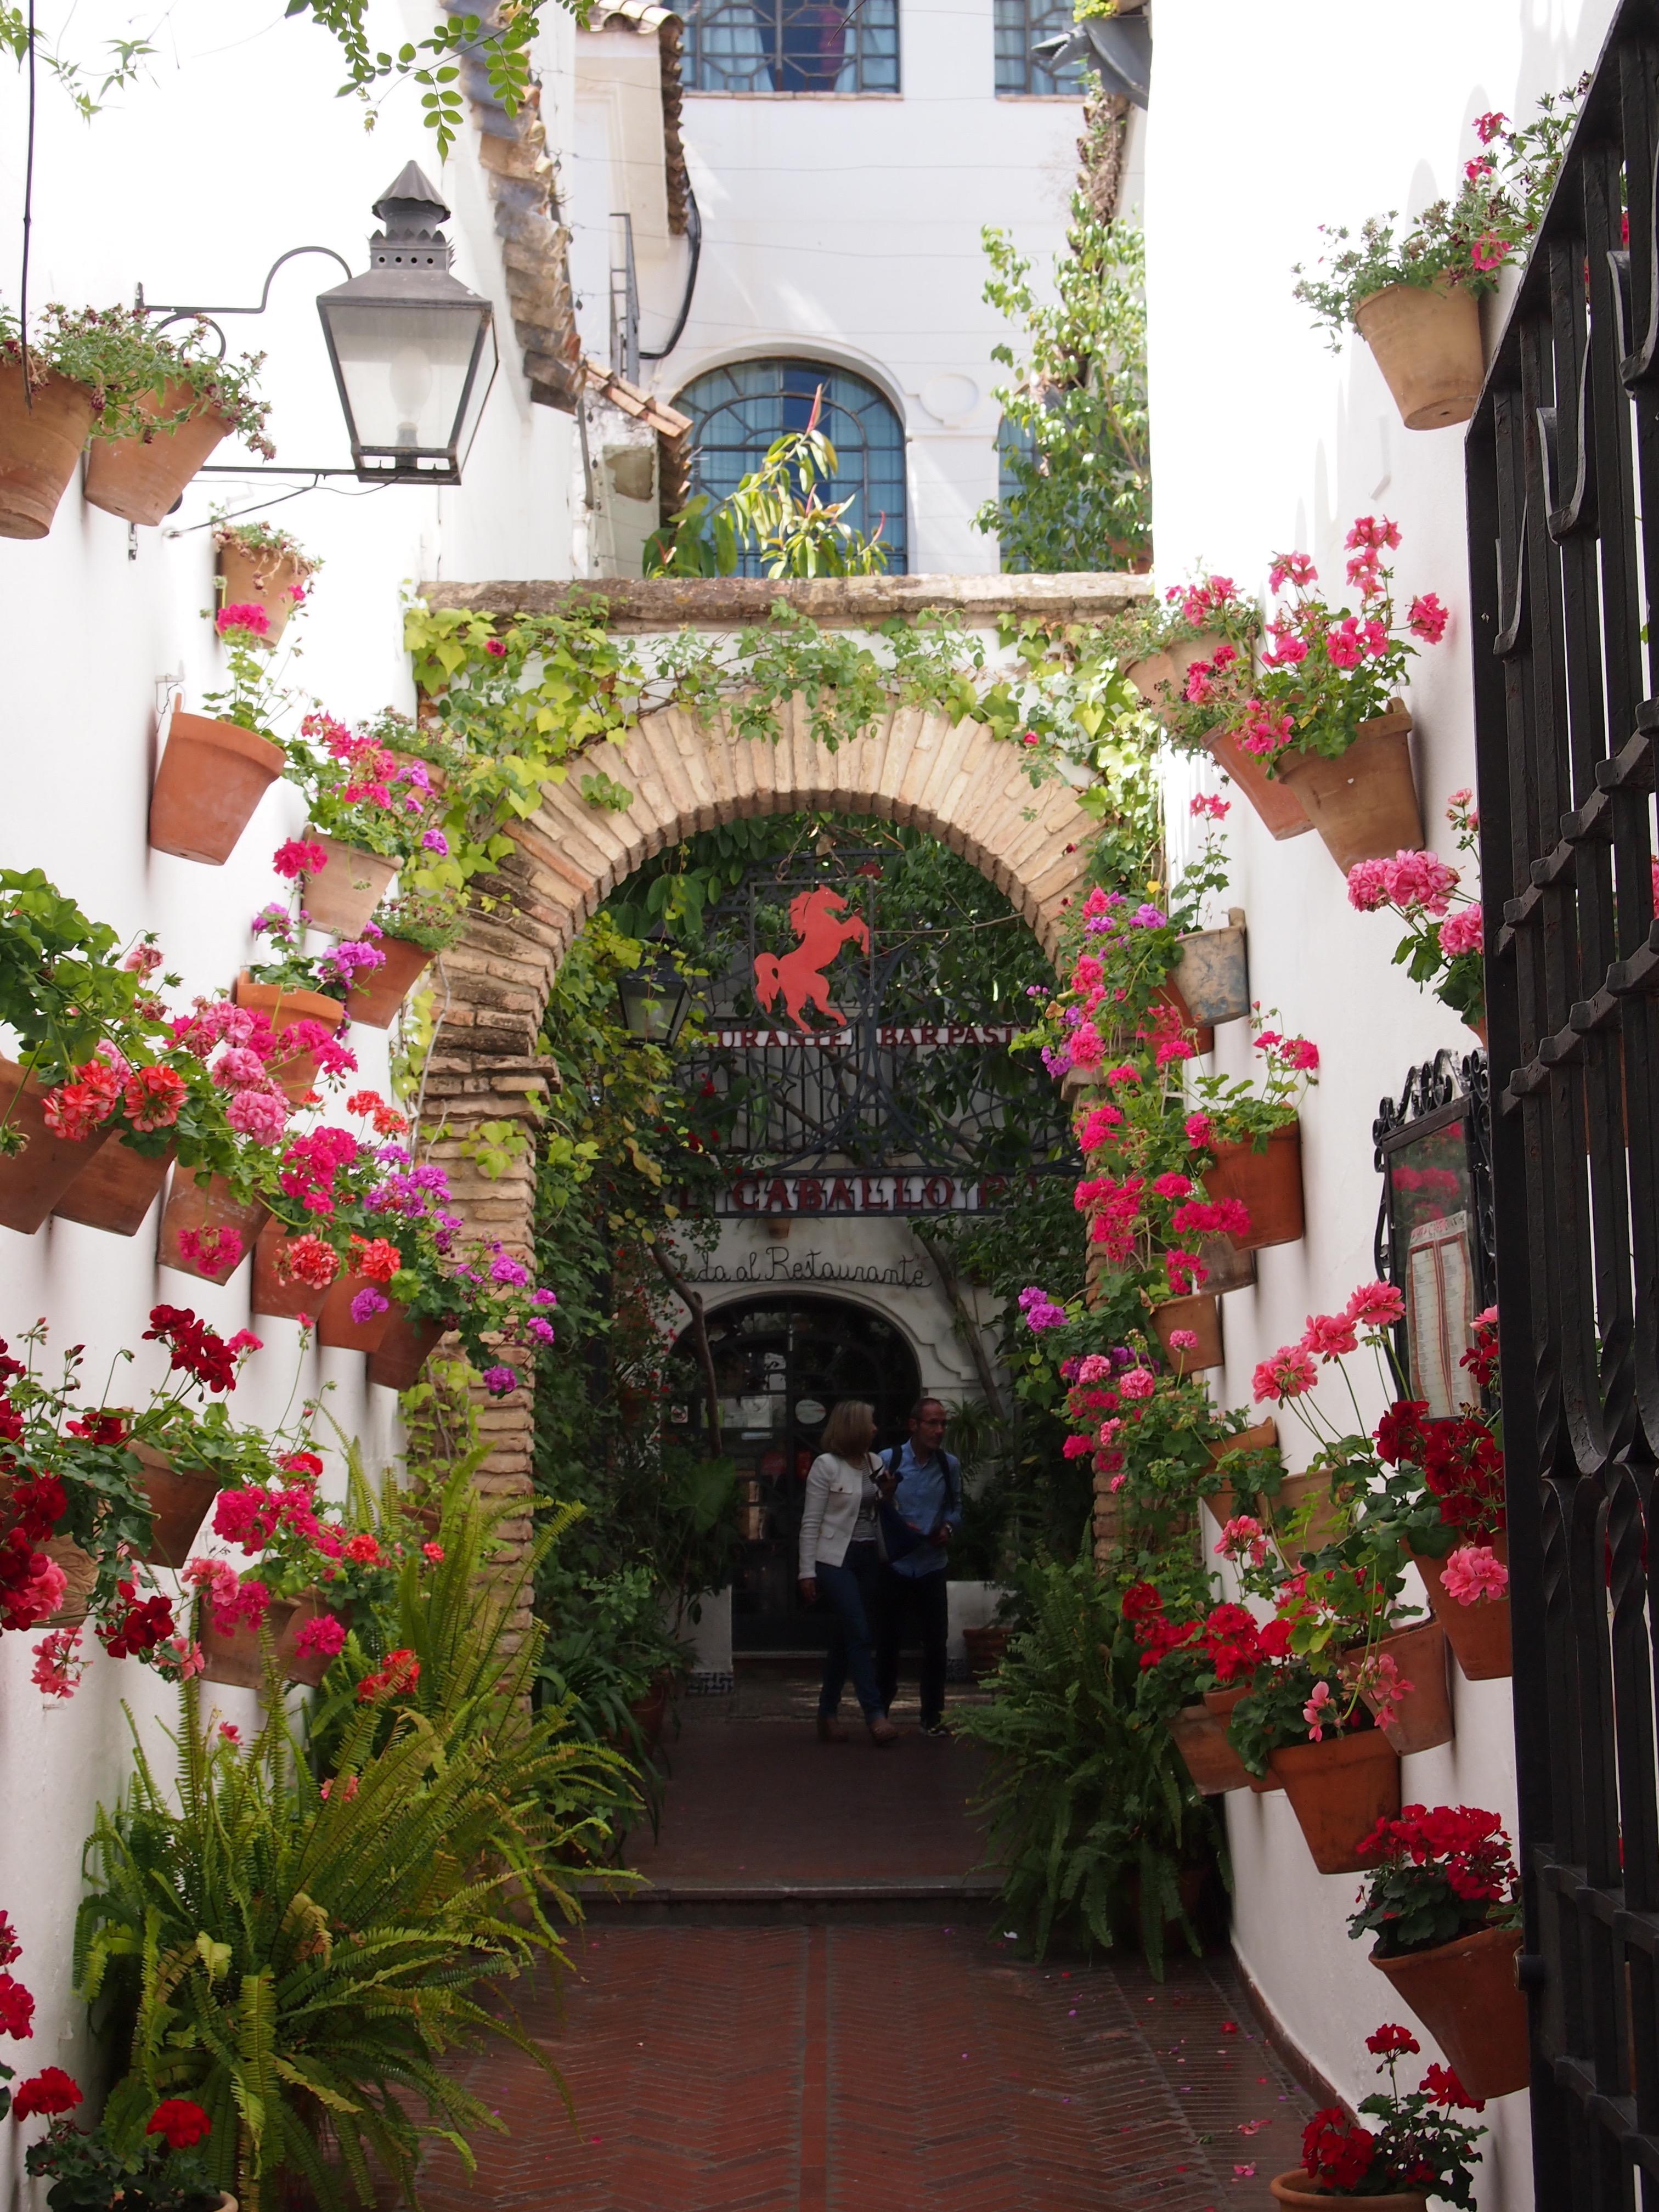 Captivating File:Córdoba Spain   Fiesta De Los Patios De Córdoba   2015.9 (18562564645)